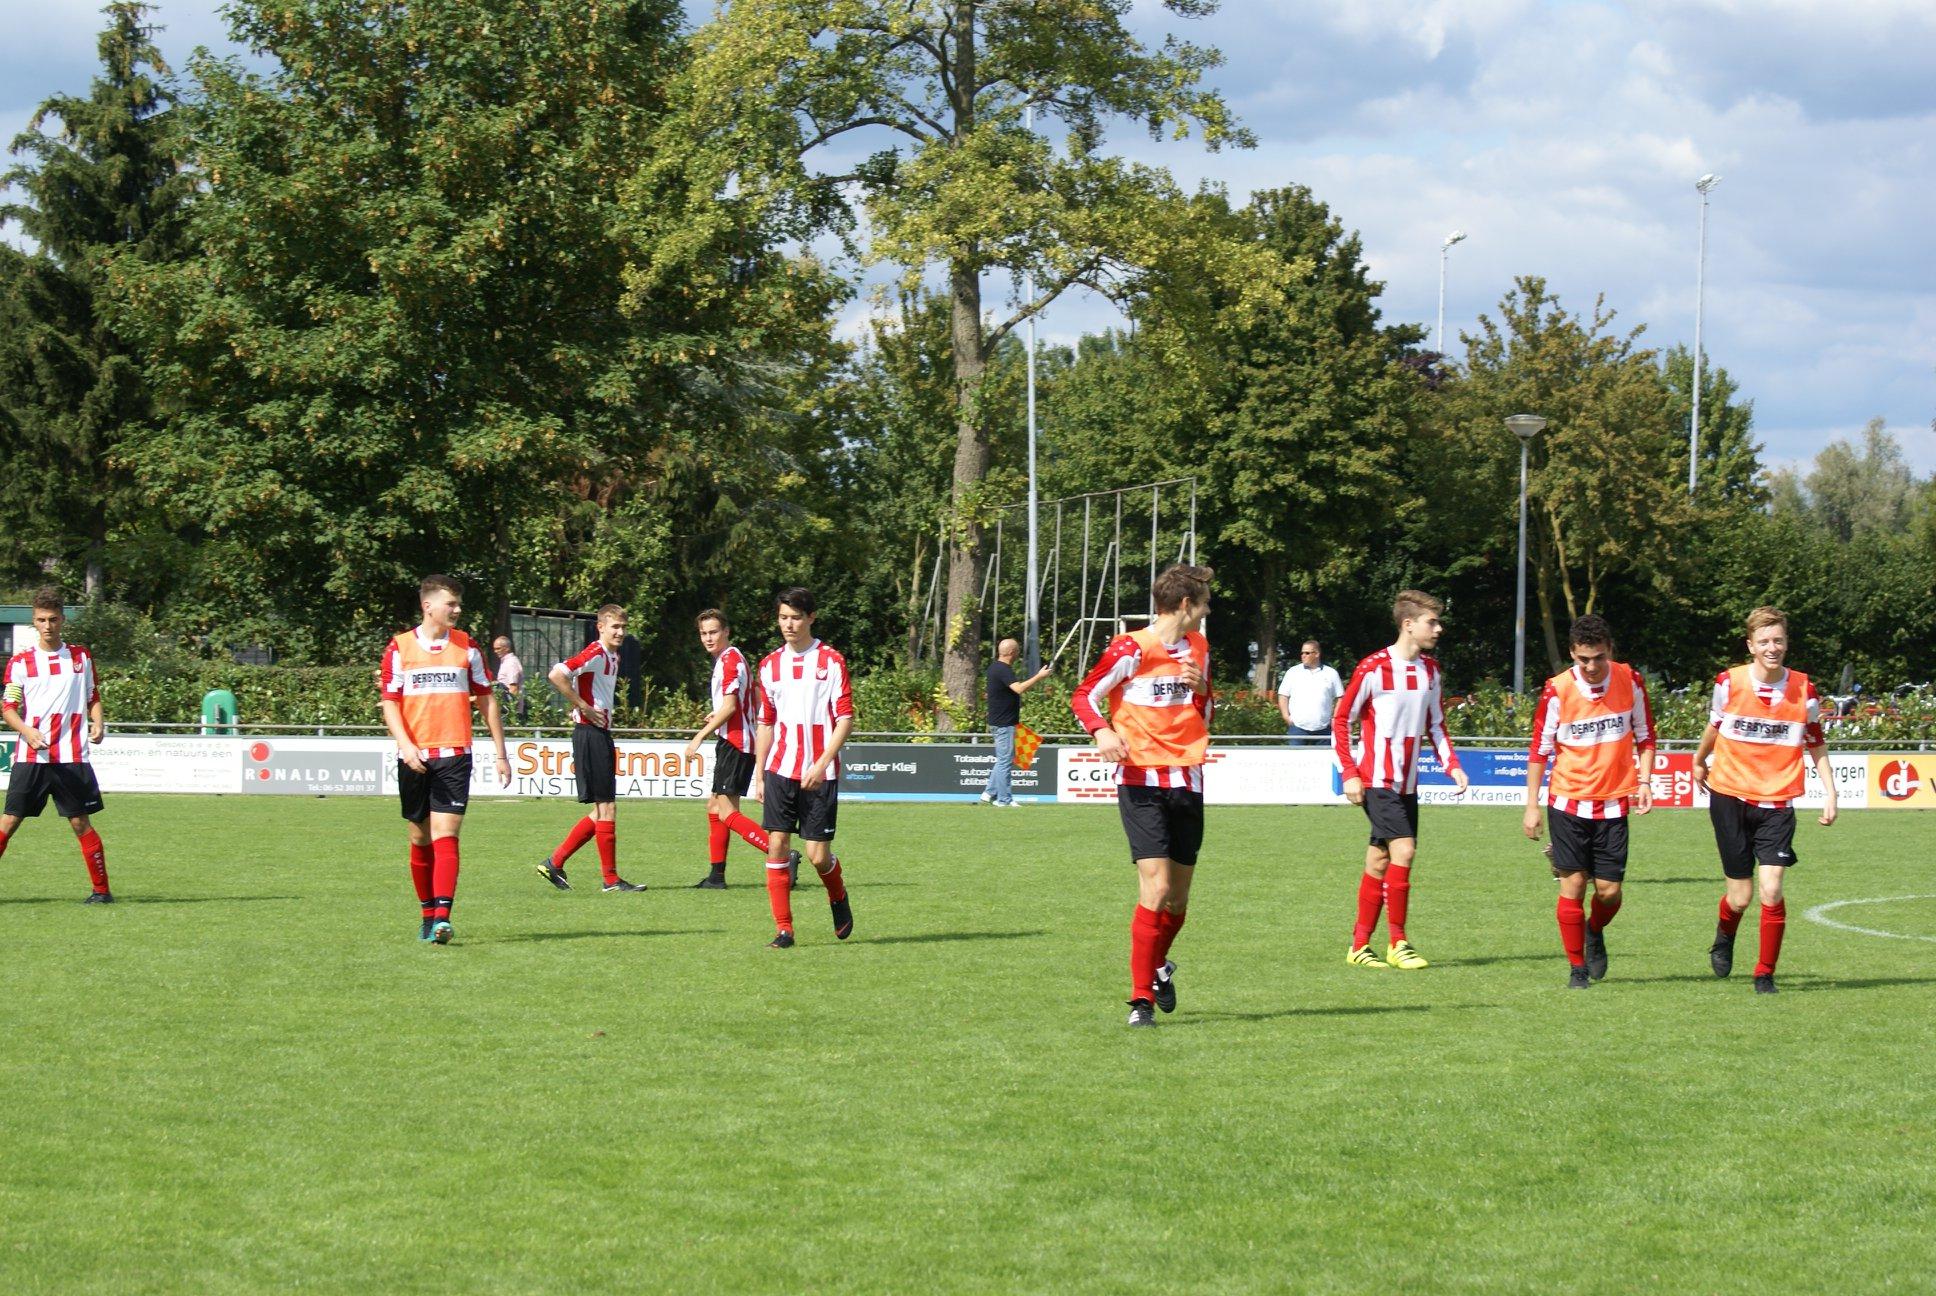 JO19-1 Arnhemse Boys Schuytgraaf